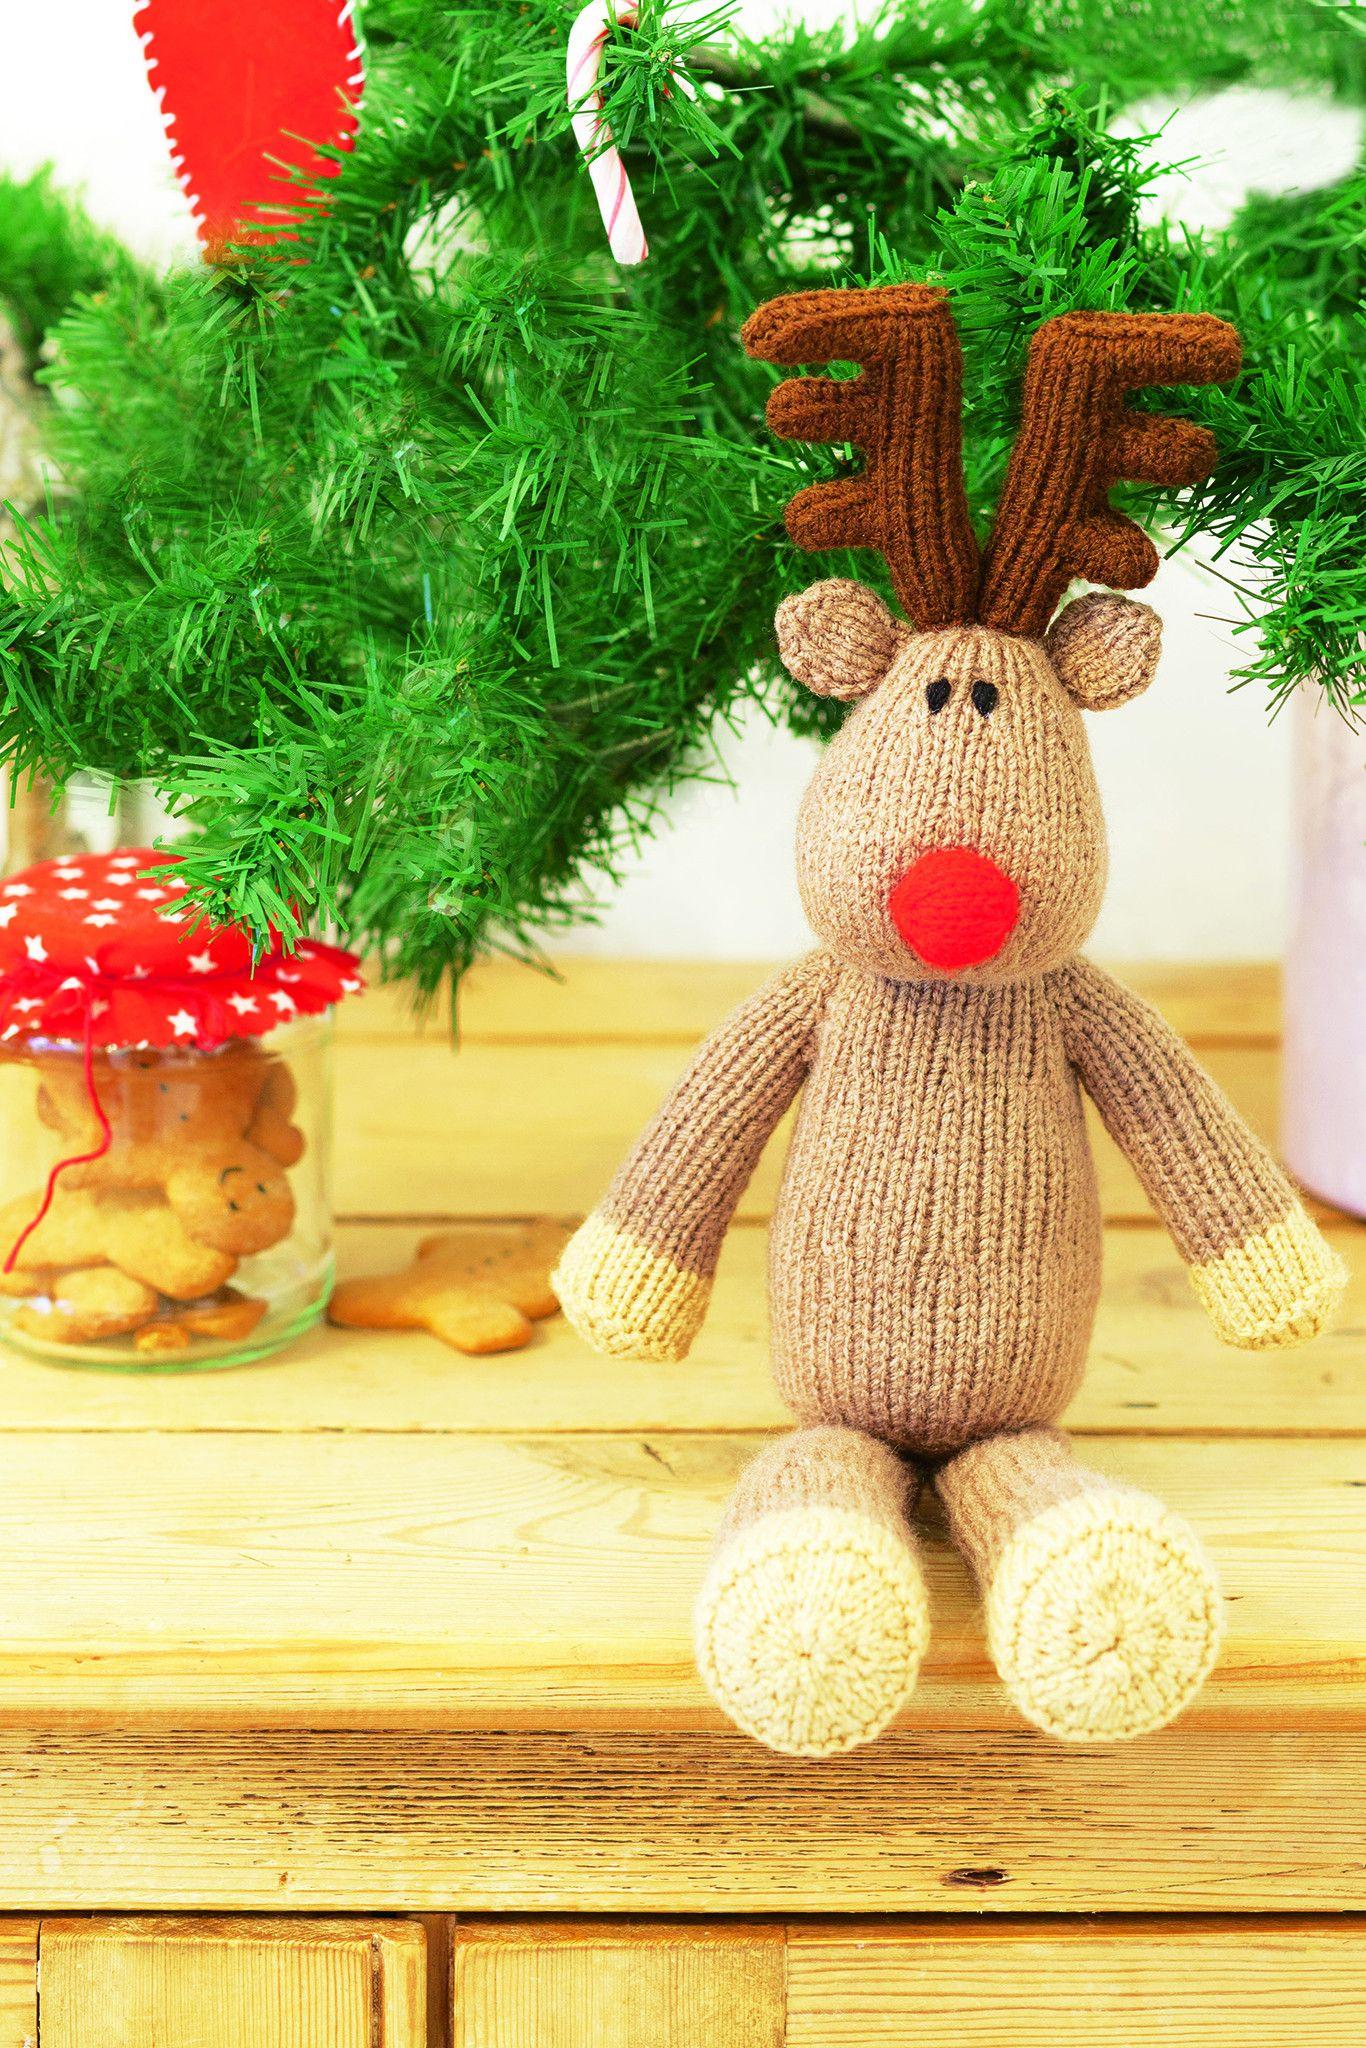 Christmas Reindeer Toy Knitting Pattern | Knitted christmas decorations, Christmas knitting ...